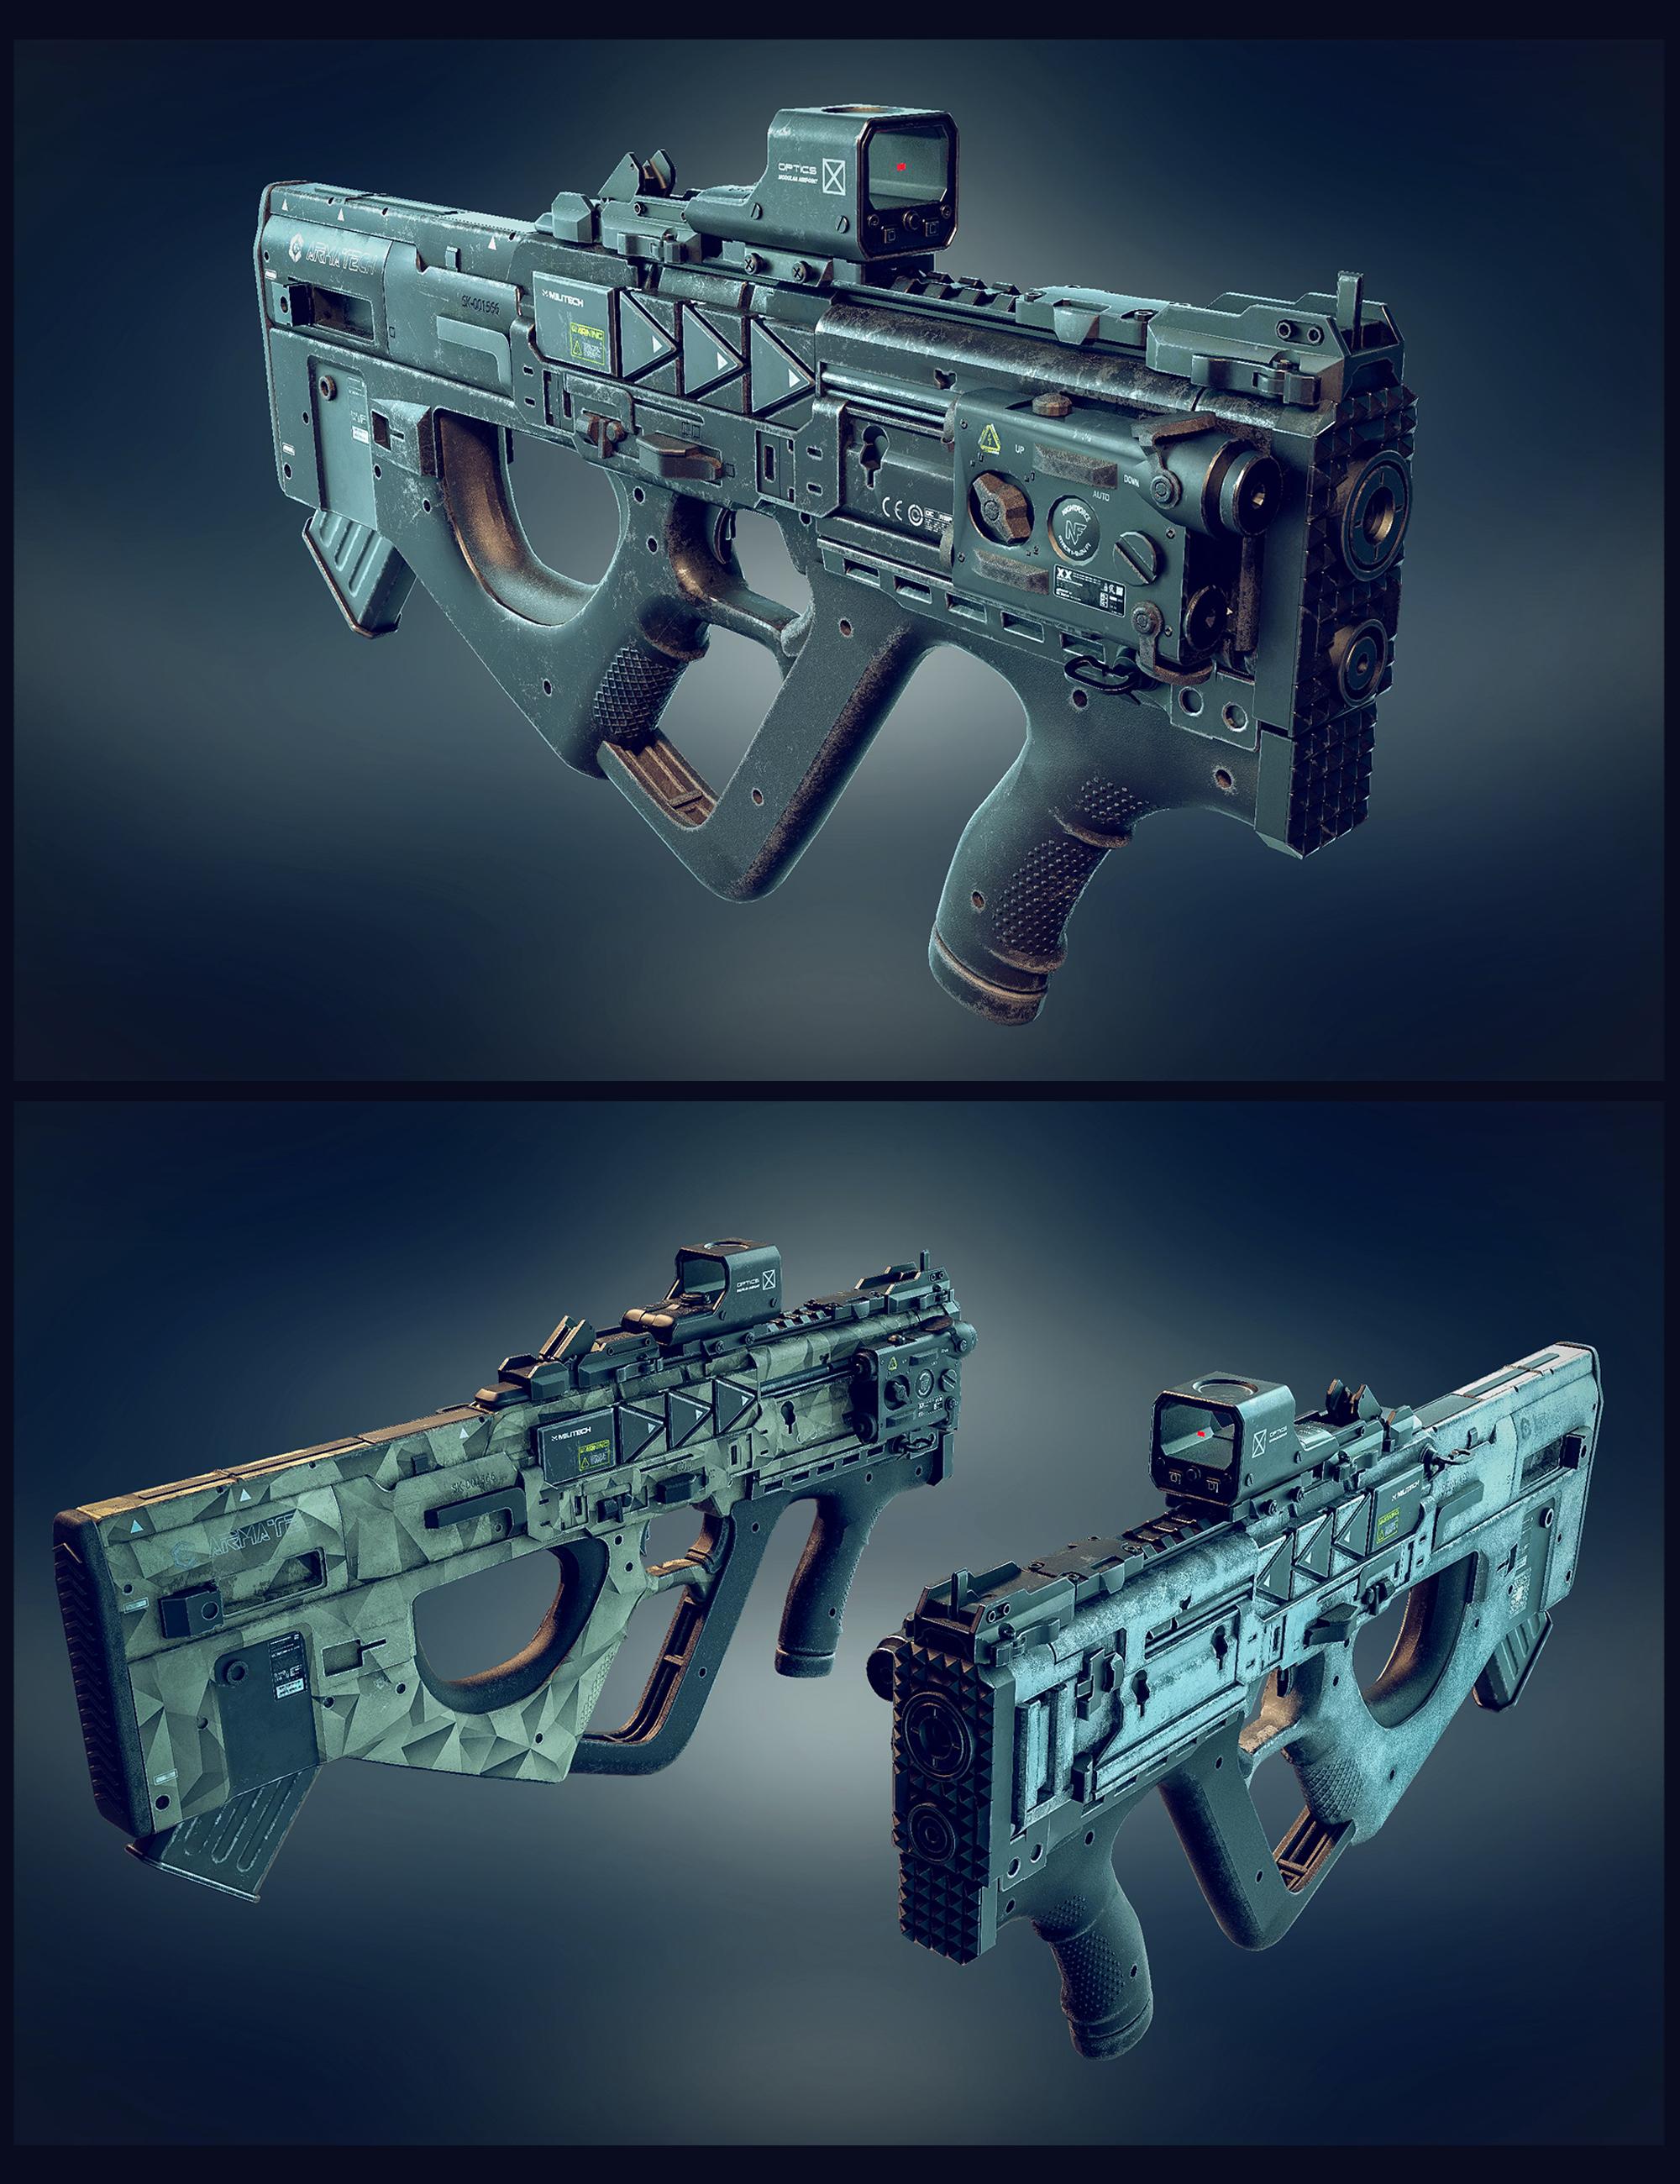 Cyberpunk Droid SMG by: Polish, 3D Models by Daz 3D